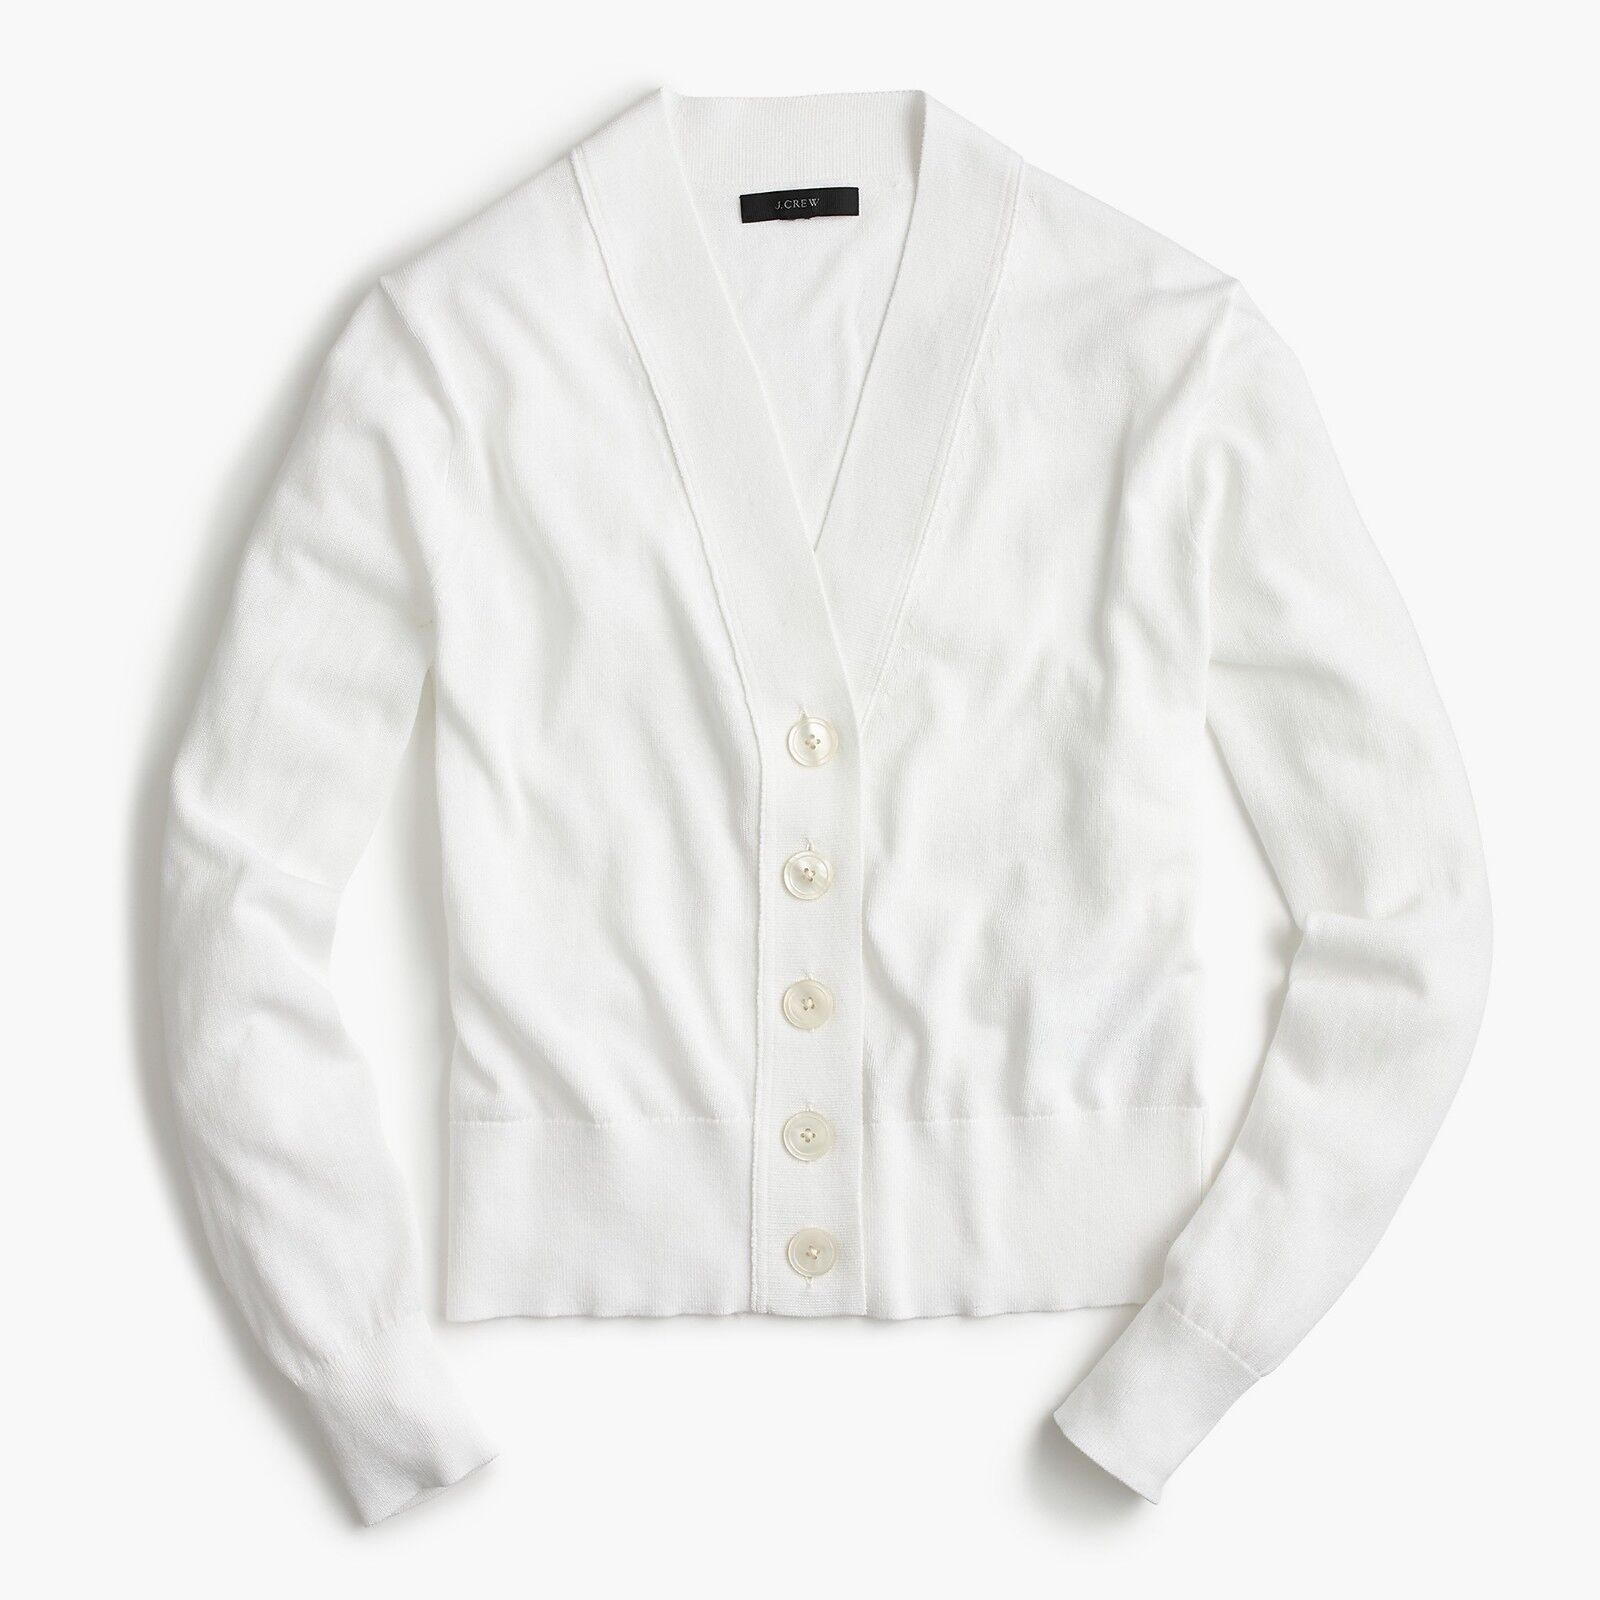 NWT J.Crew Cropped Lightweight Cardigan Sweater - - - White - Medium 567f74